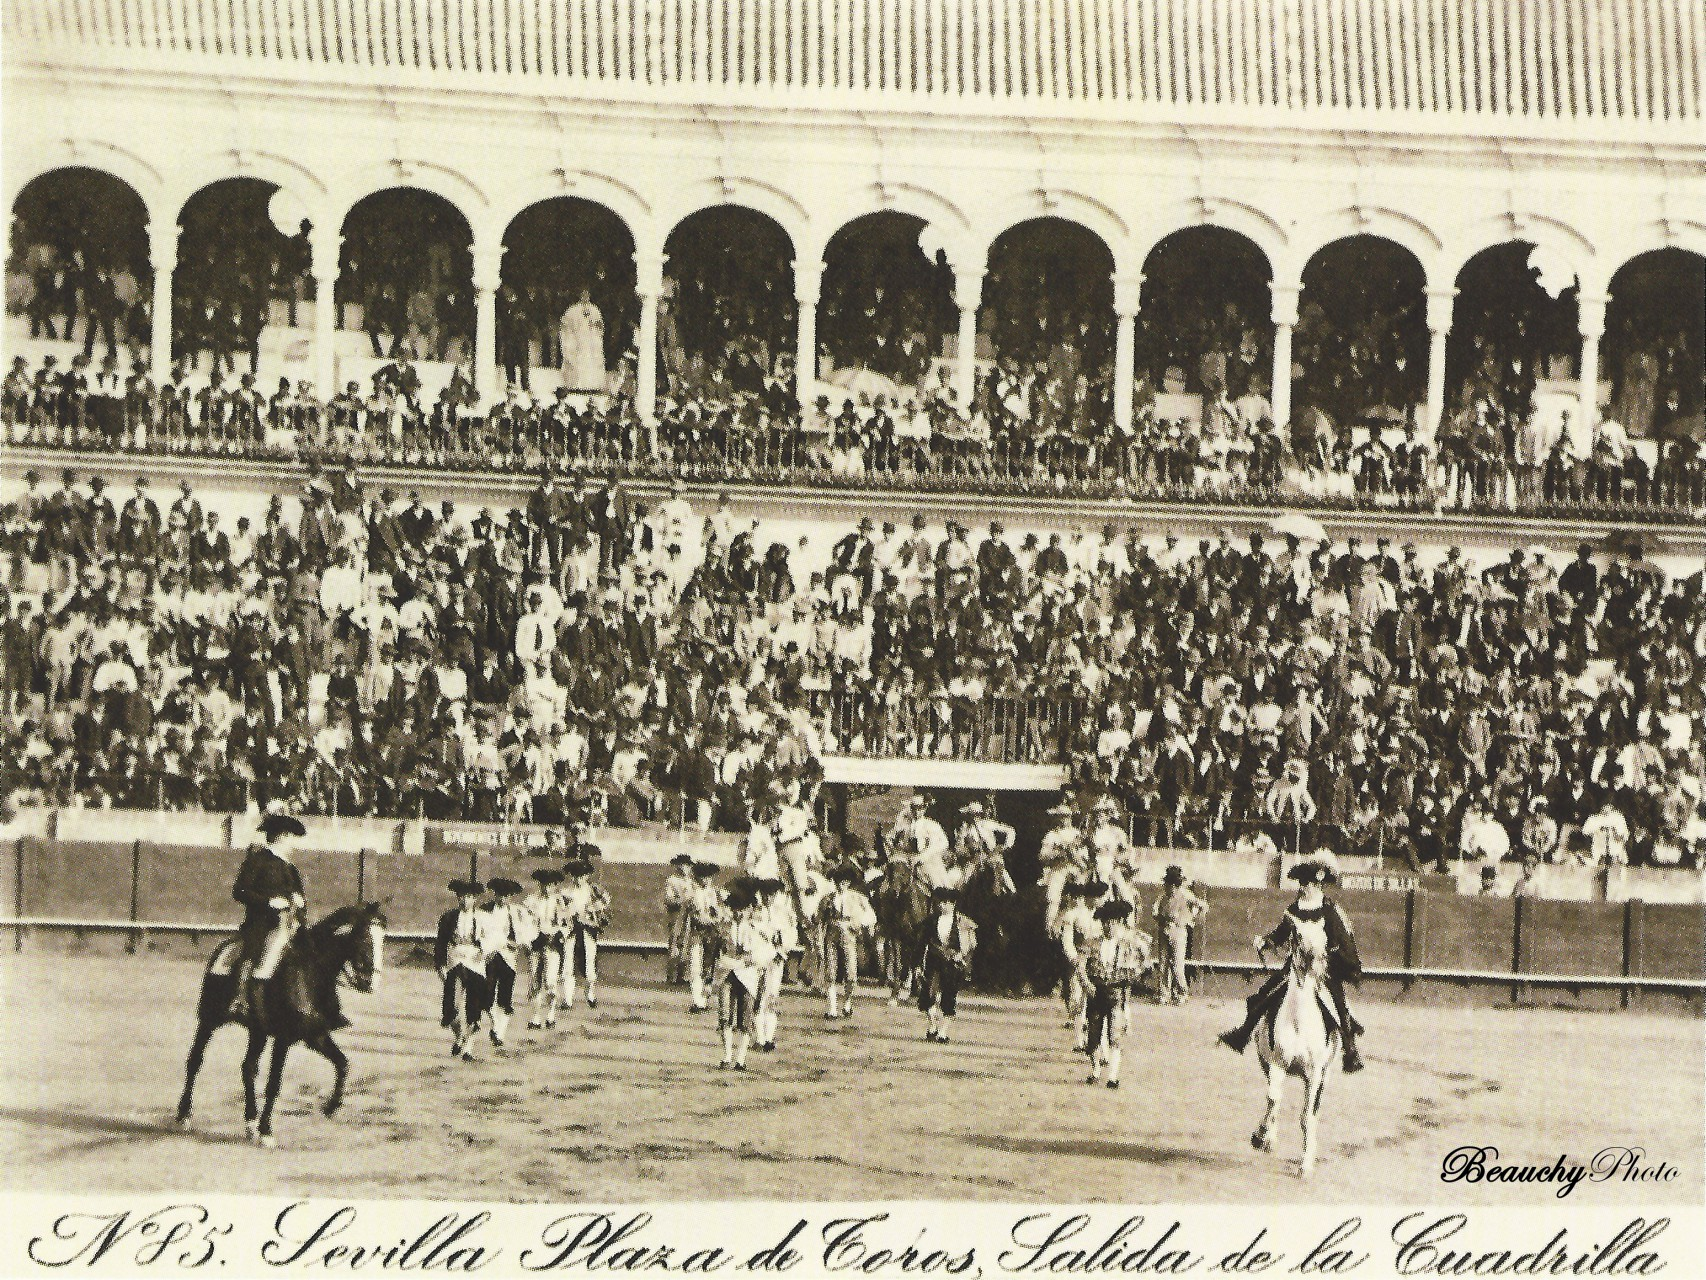 Corridas de toros en Sevilla